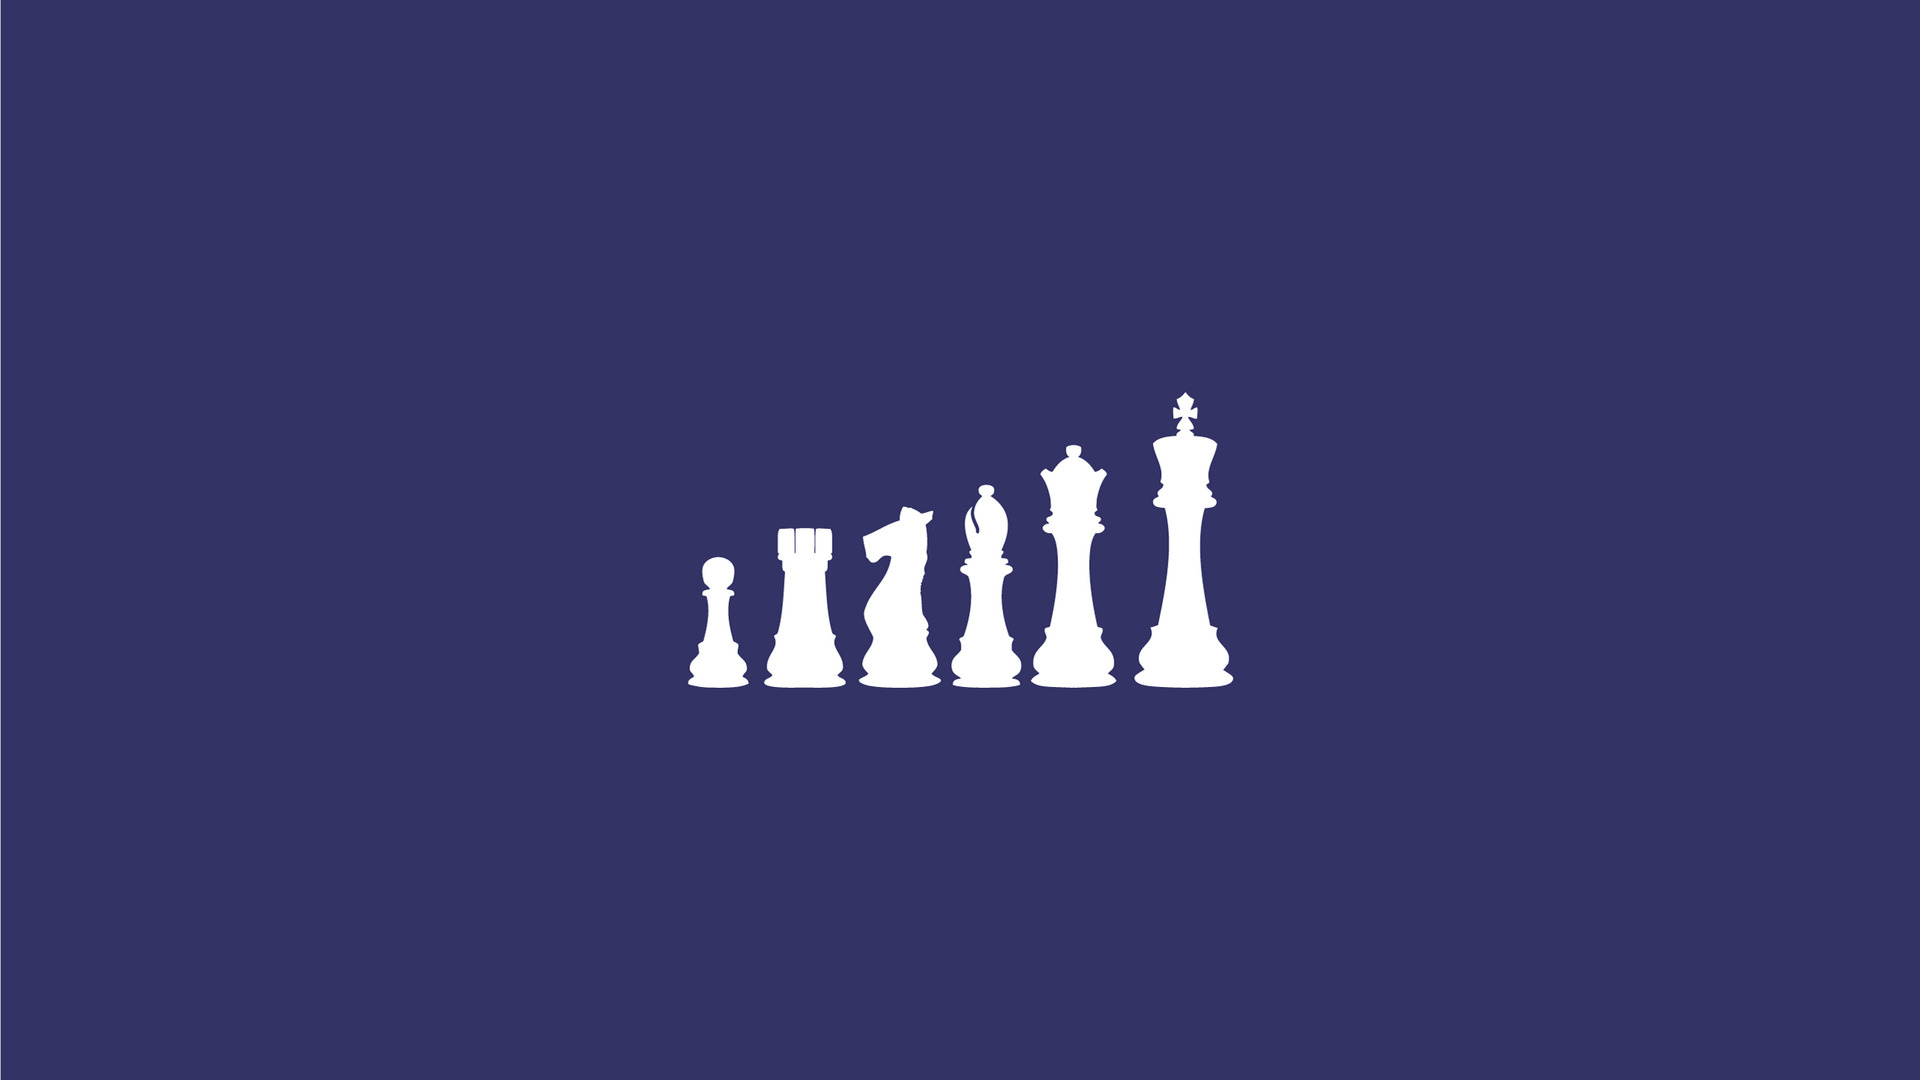 Chess Public Test #1's thumbnail